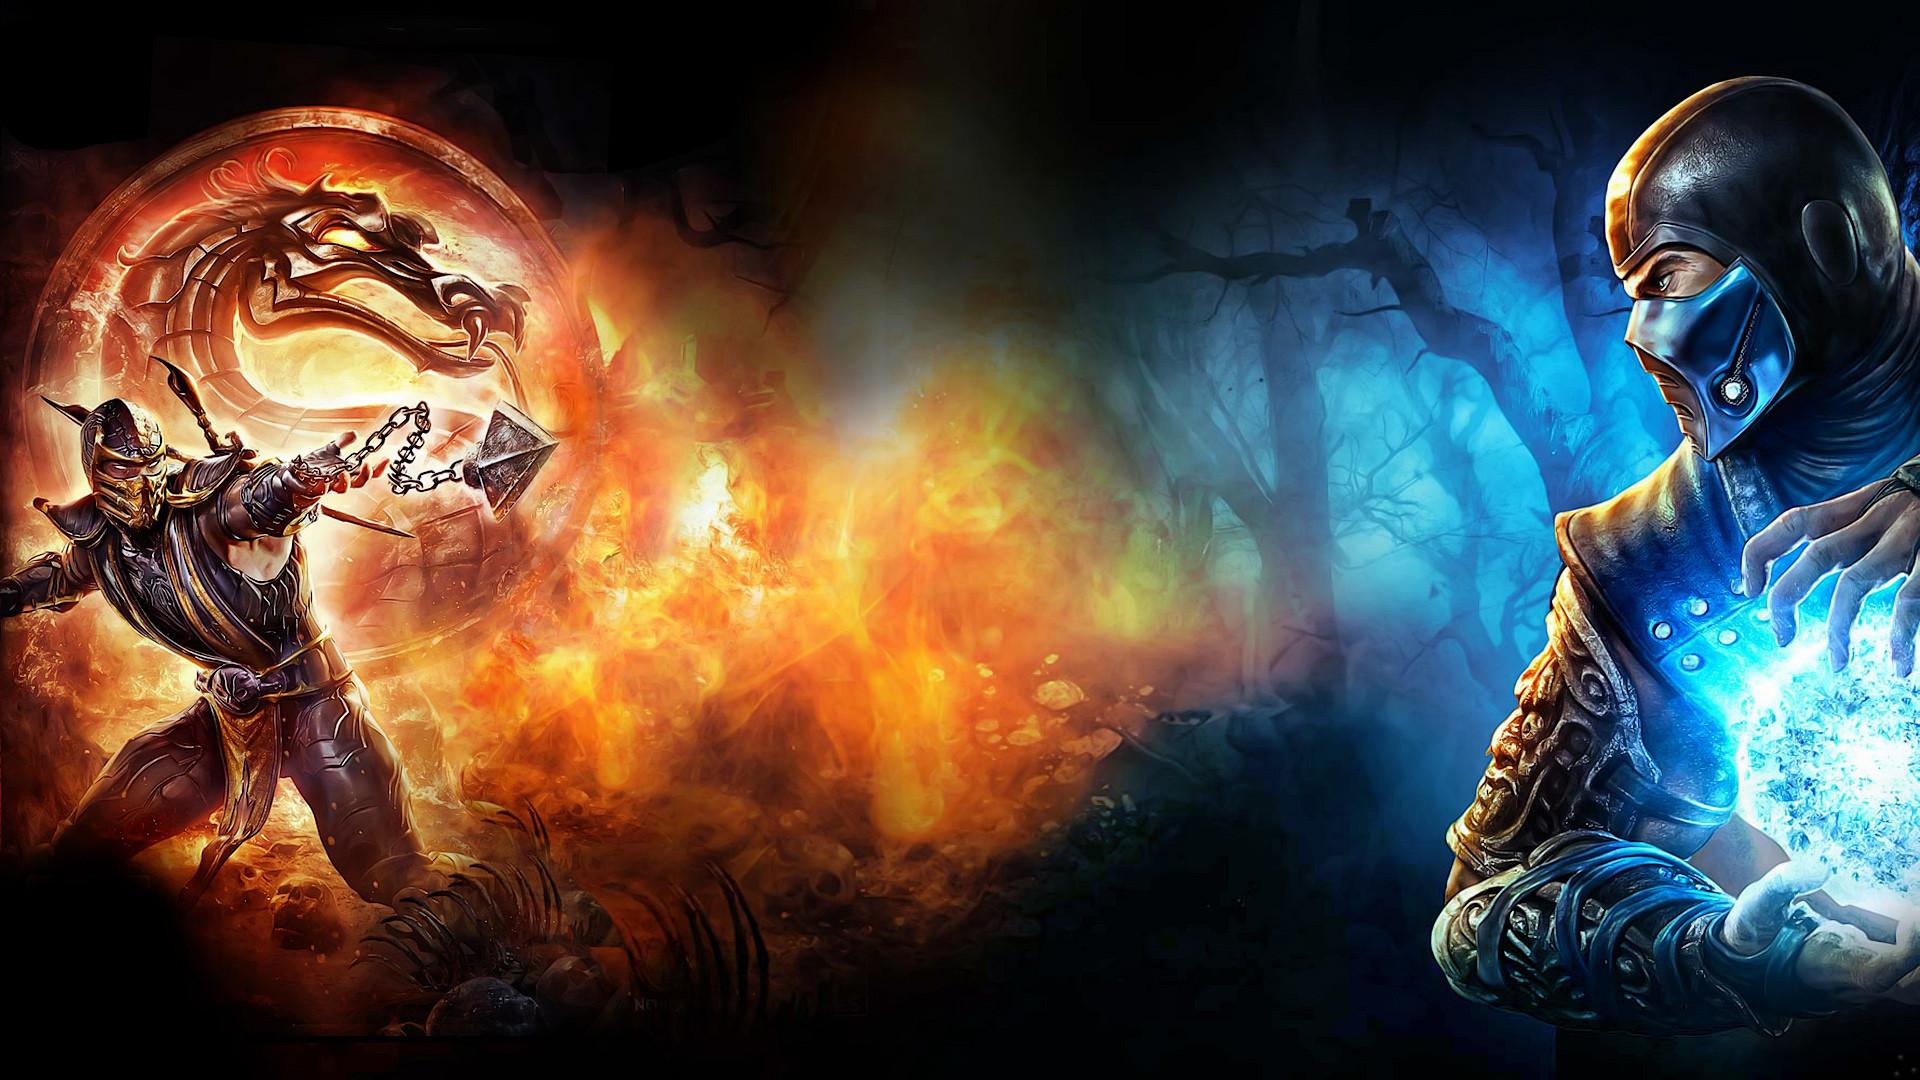 Mortal Kombat Characters Wallpapers 70 Pictures